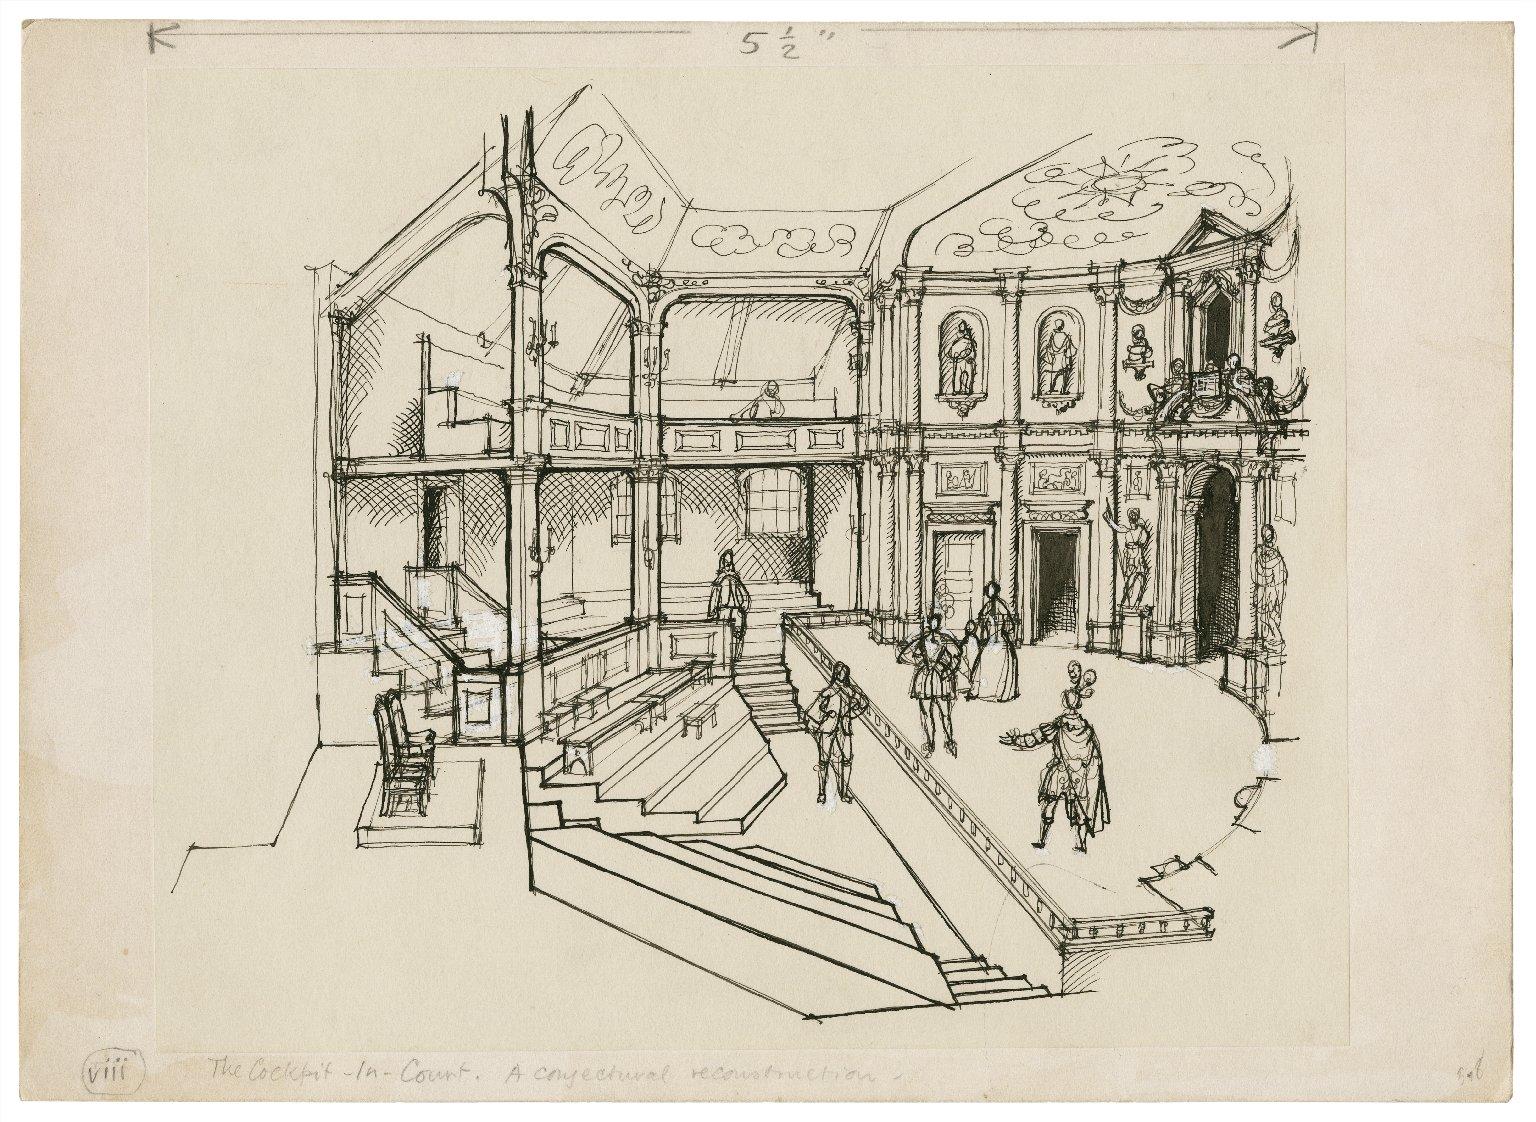 Interior of the Cockpit-in-Court Theatre, 1632